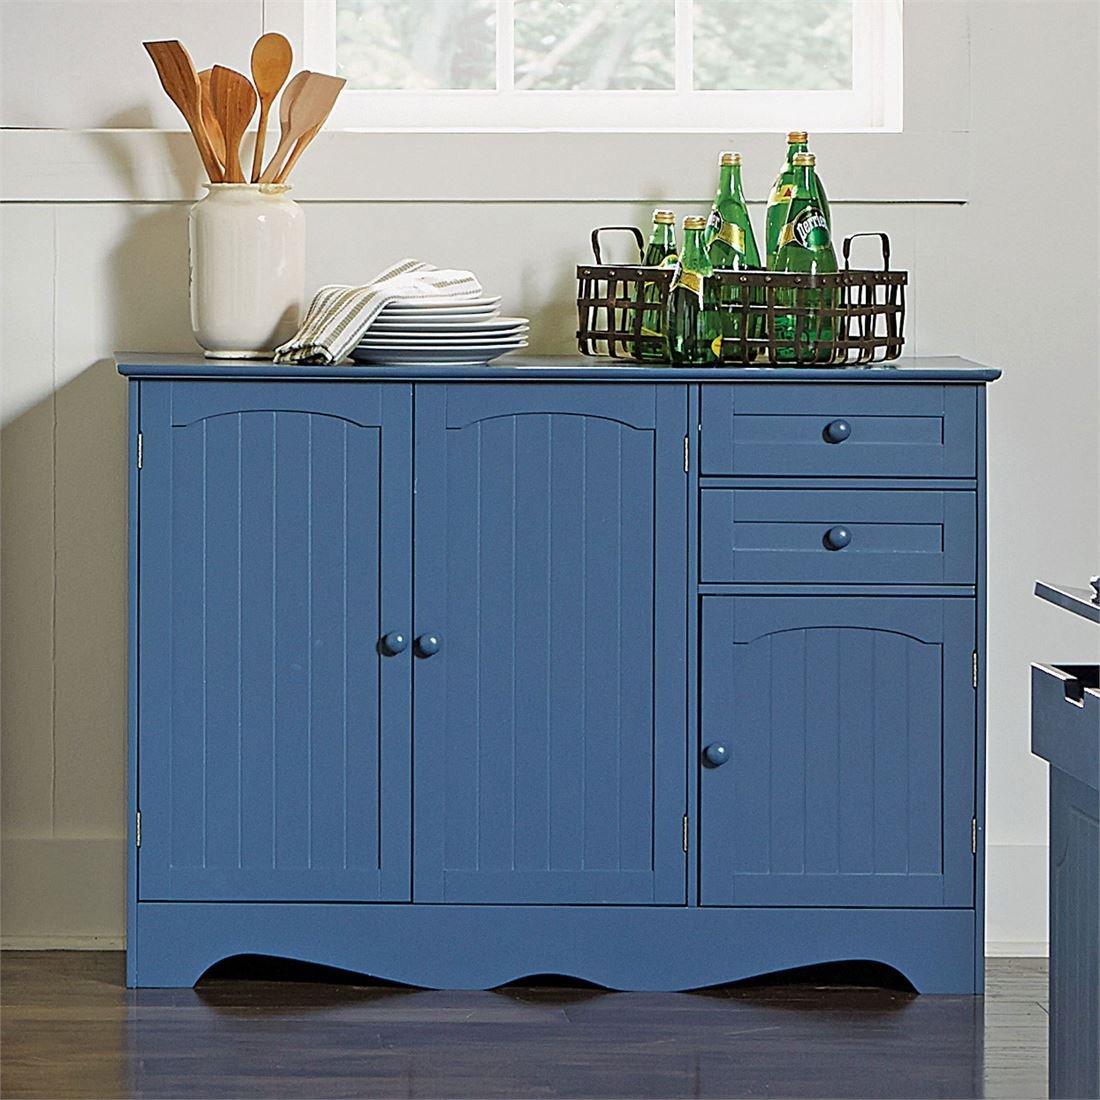 Amazon.com - Brylanehome Country Kitchen Buffet (Blue, 0) - Buffets ...